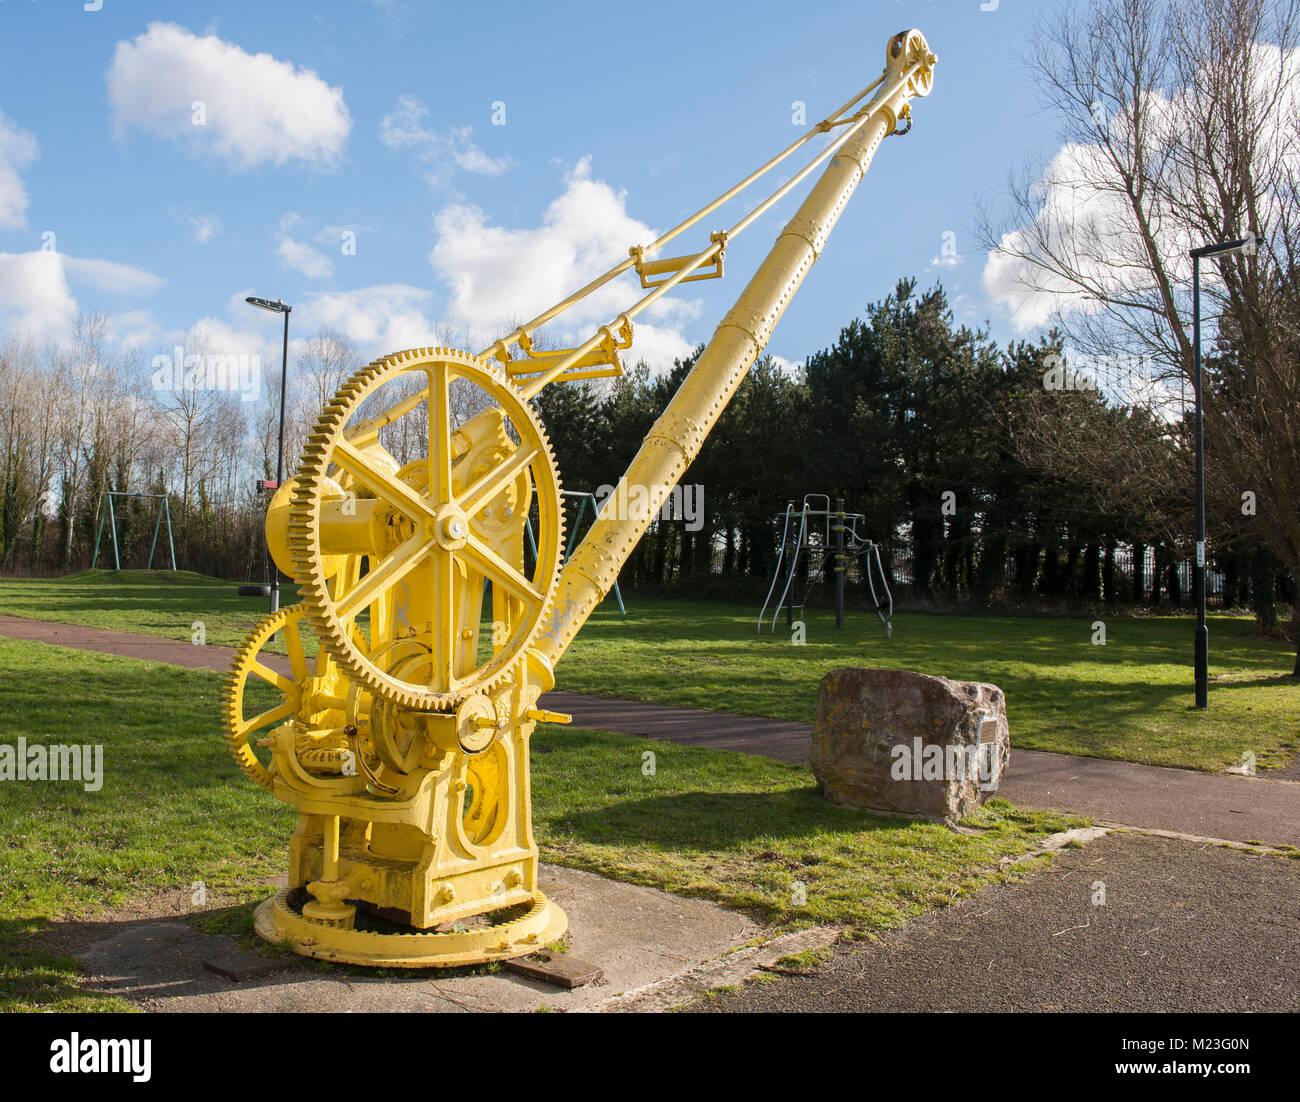 An old hoist on display at the Redbridge Wharf Park, beside the River Test at Redbridge, Southampton, Hampshire, - Stock Image